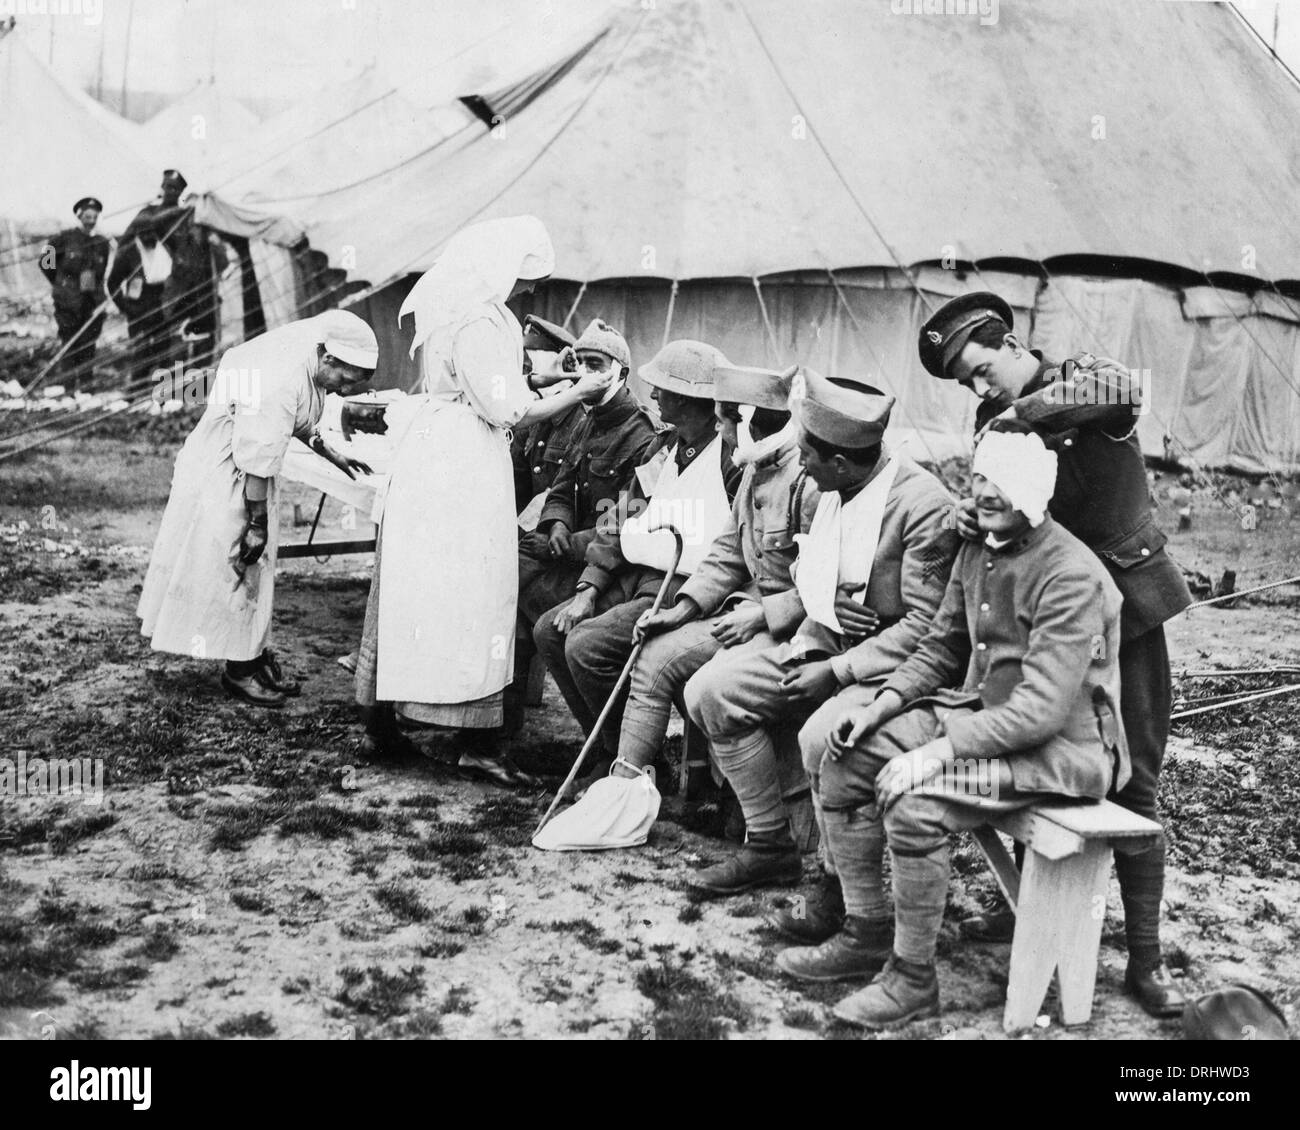 australia and britain relationship ww1 casualties